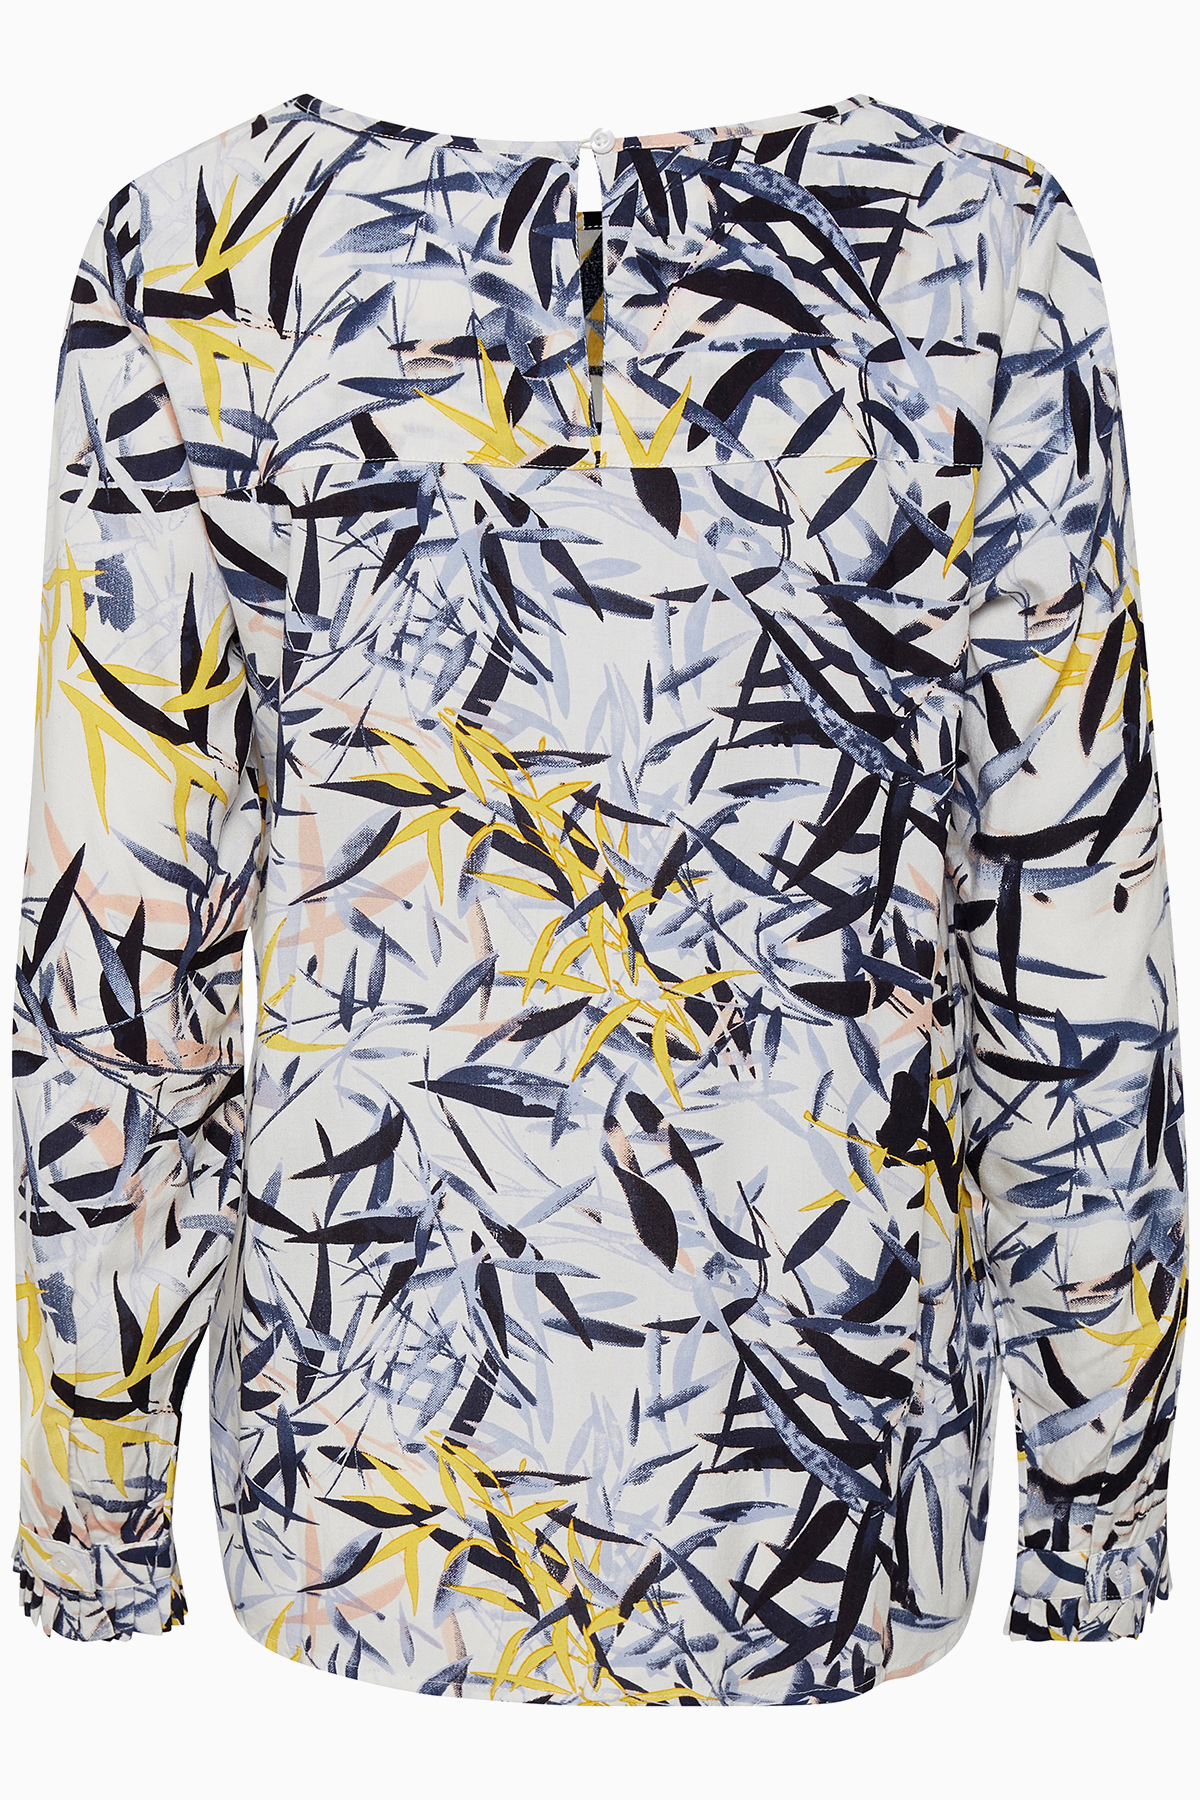 Wollweiss/marineblau Langarm-Bluse von Kaffe – Shoppen SieWollweiss/marineblau Langarm-Bluse ab Gr. 34-46 hier